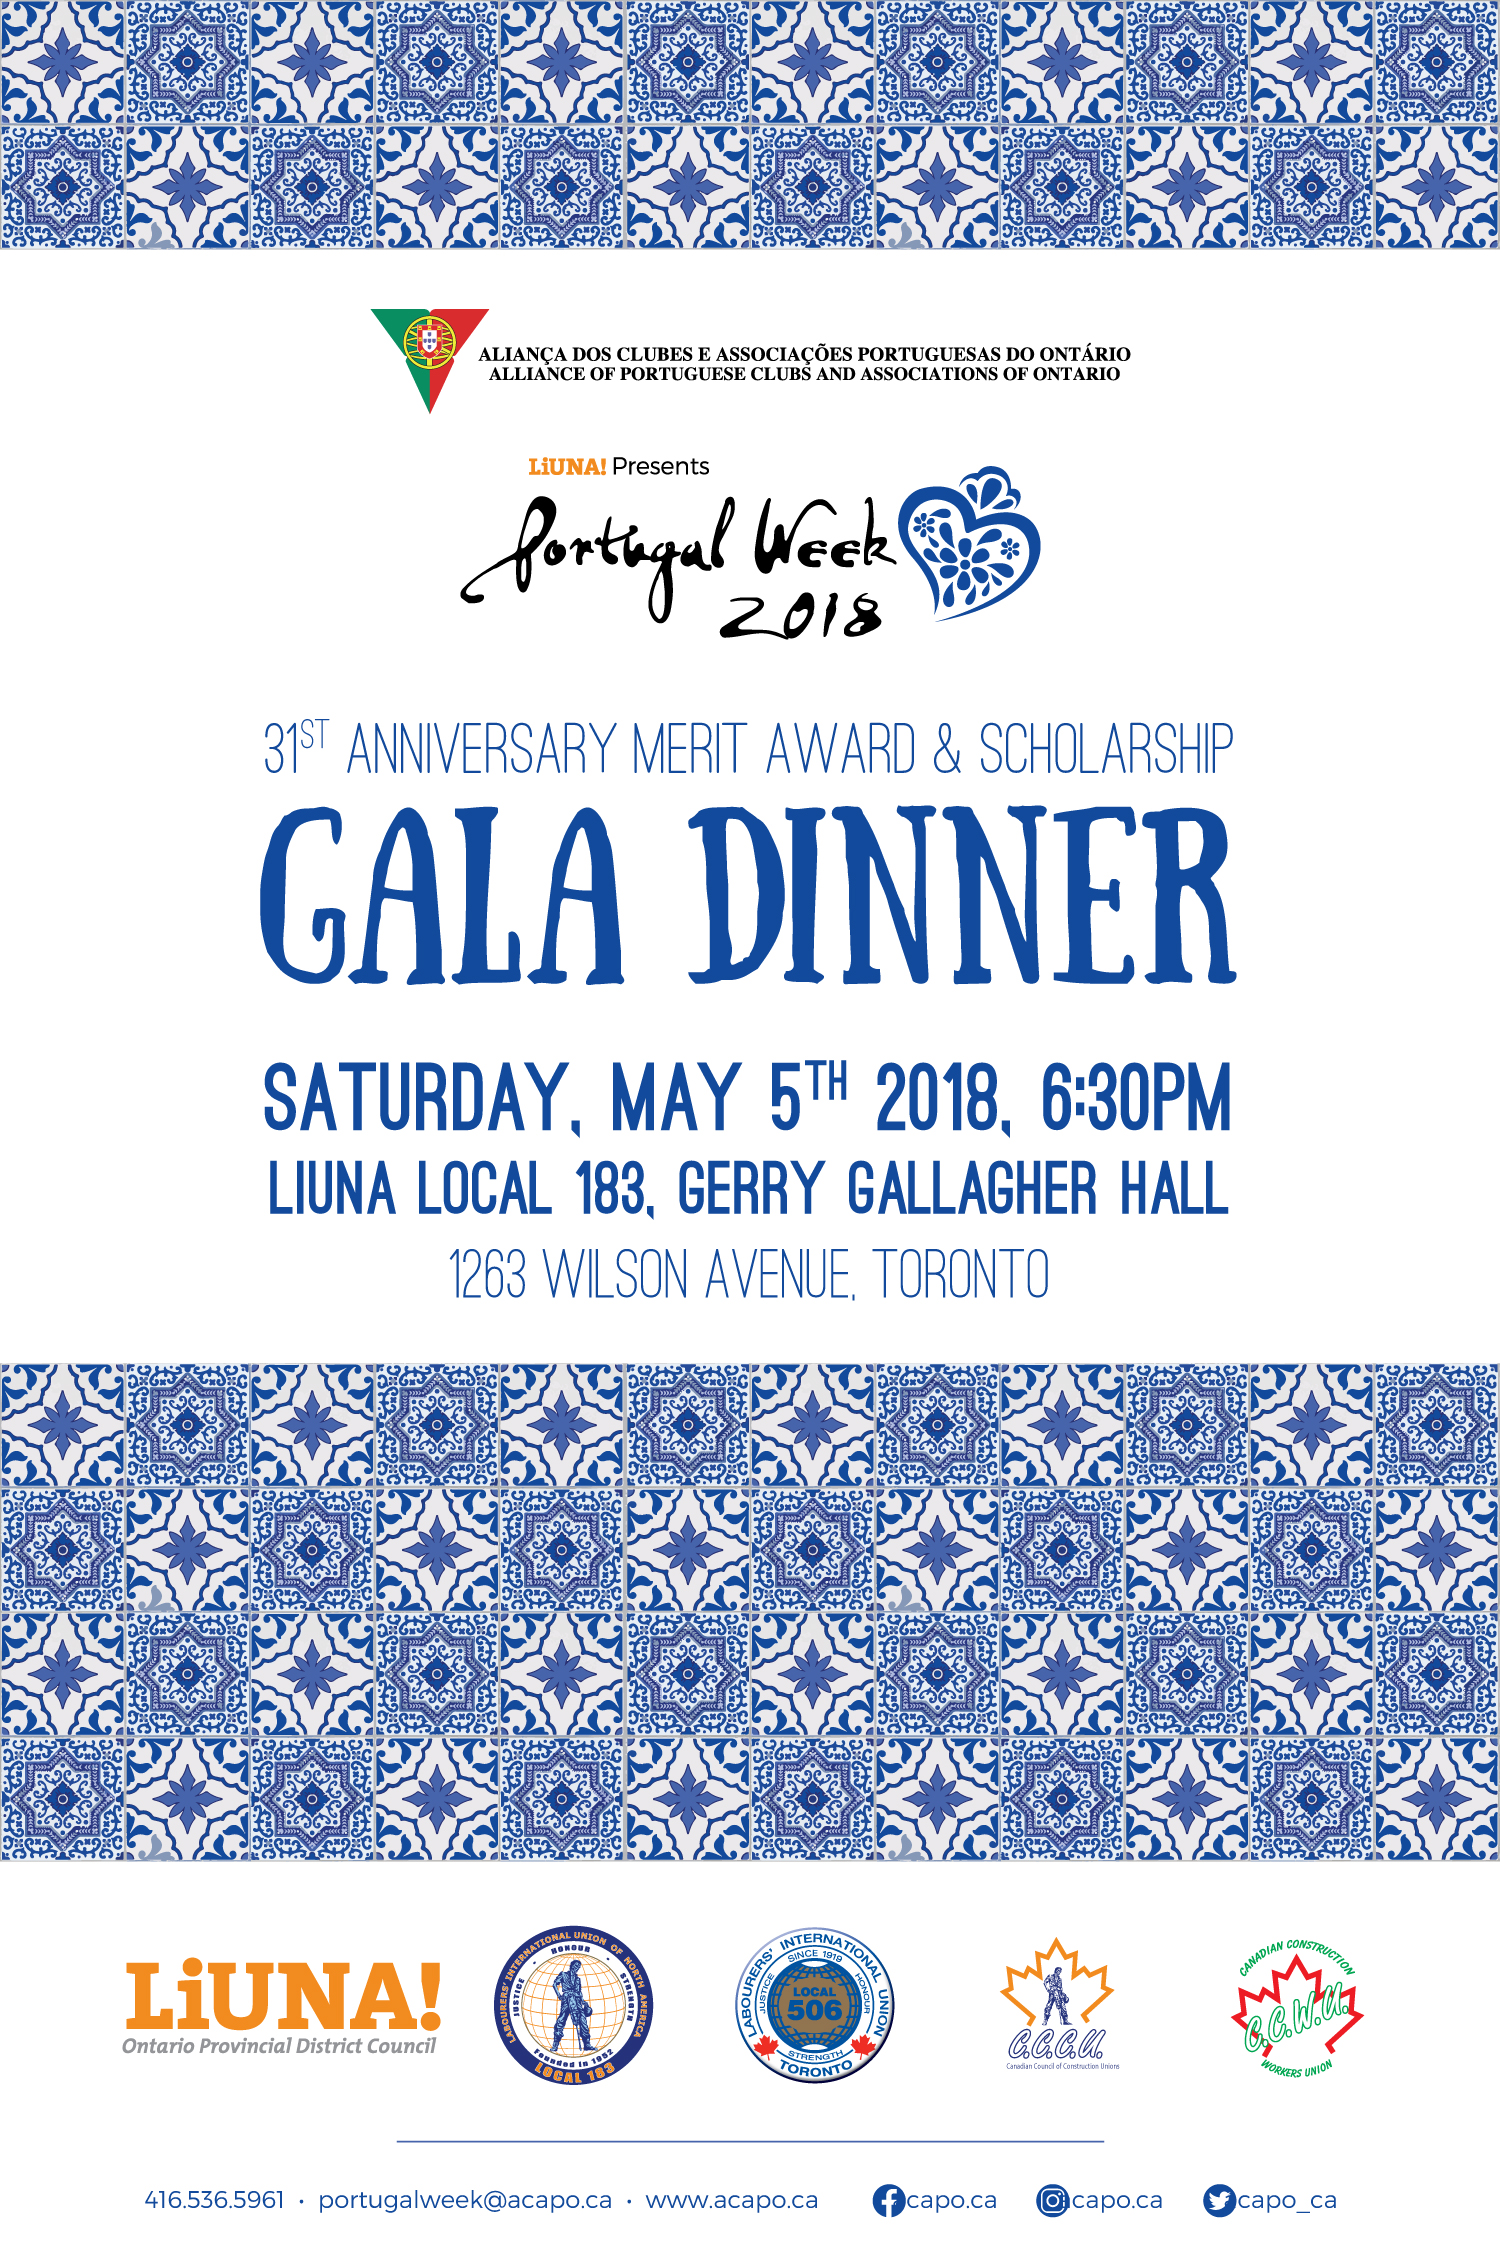 PW2018 gala poster